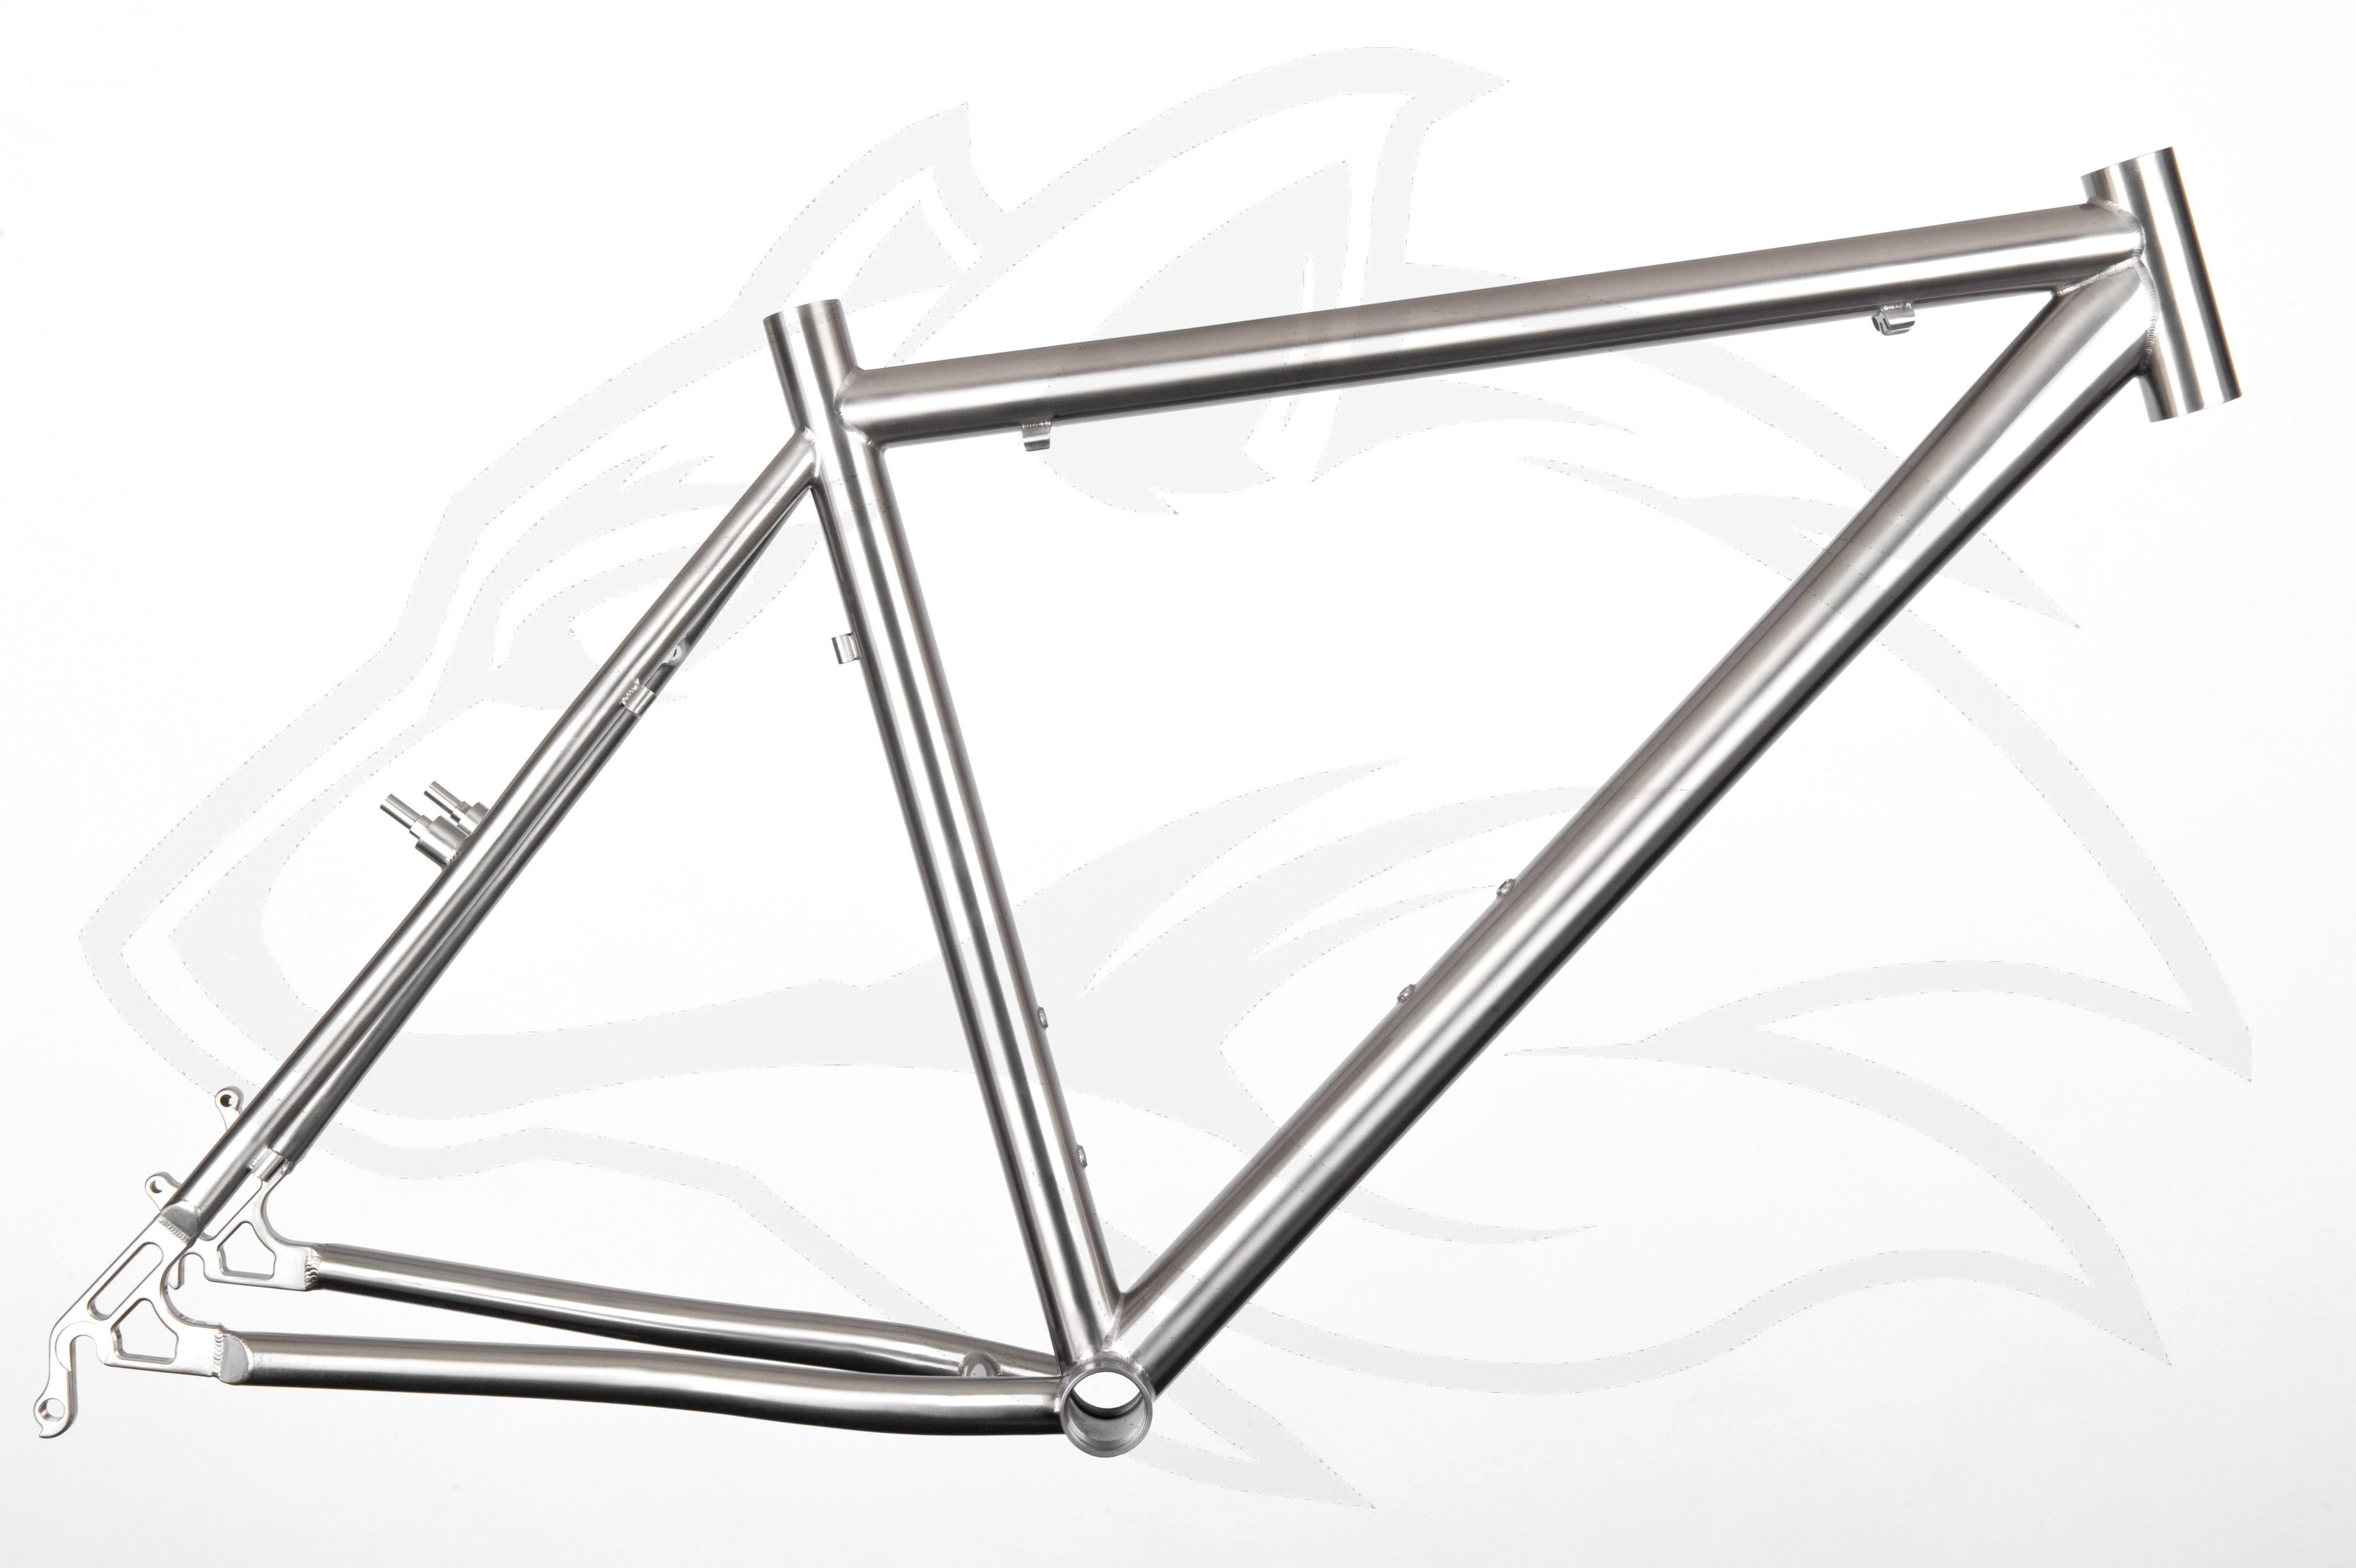 26er MTB Standardrahmen - Individueller Fahrradbau - Titanteile